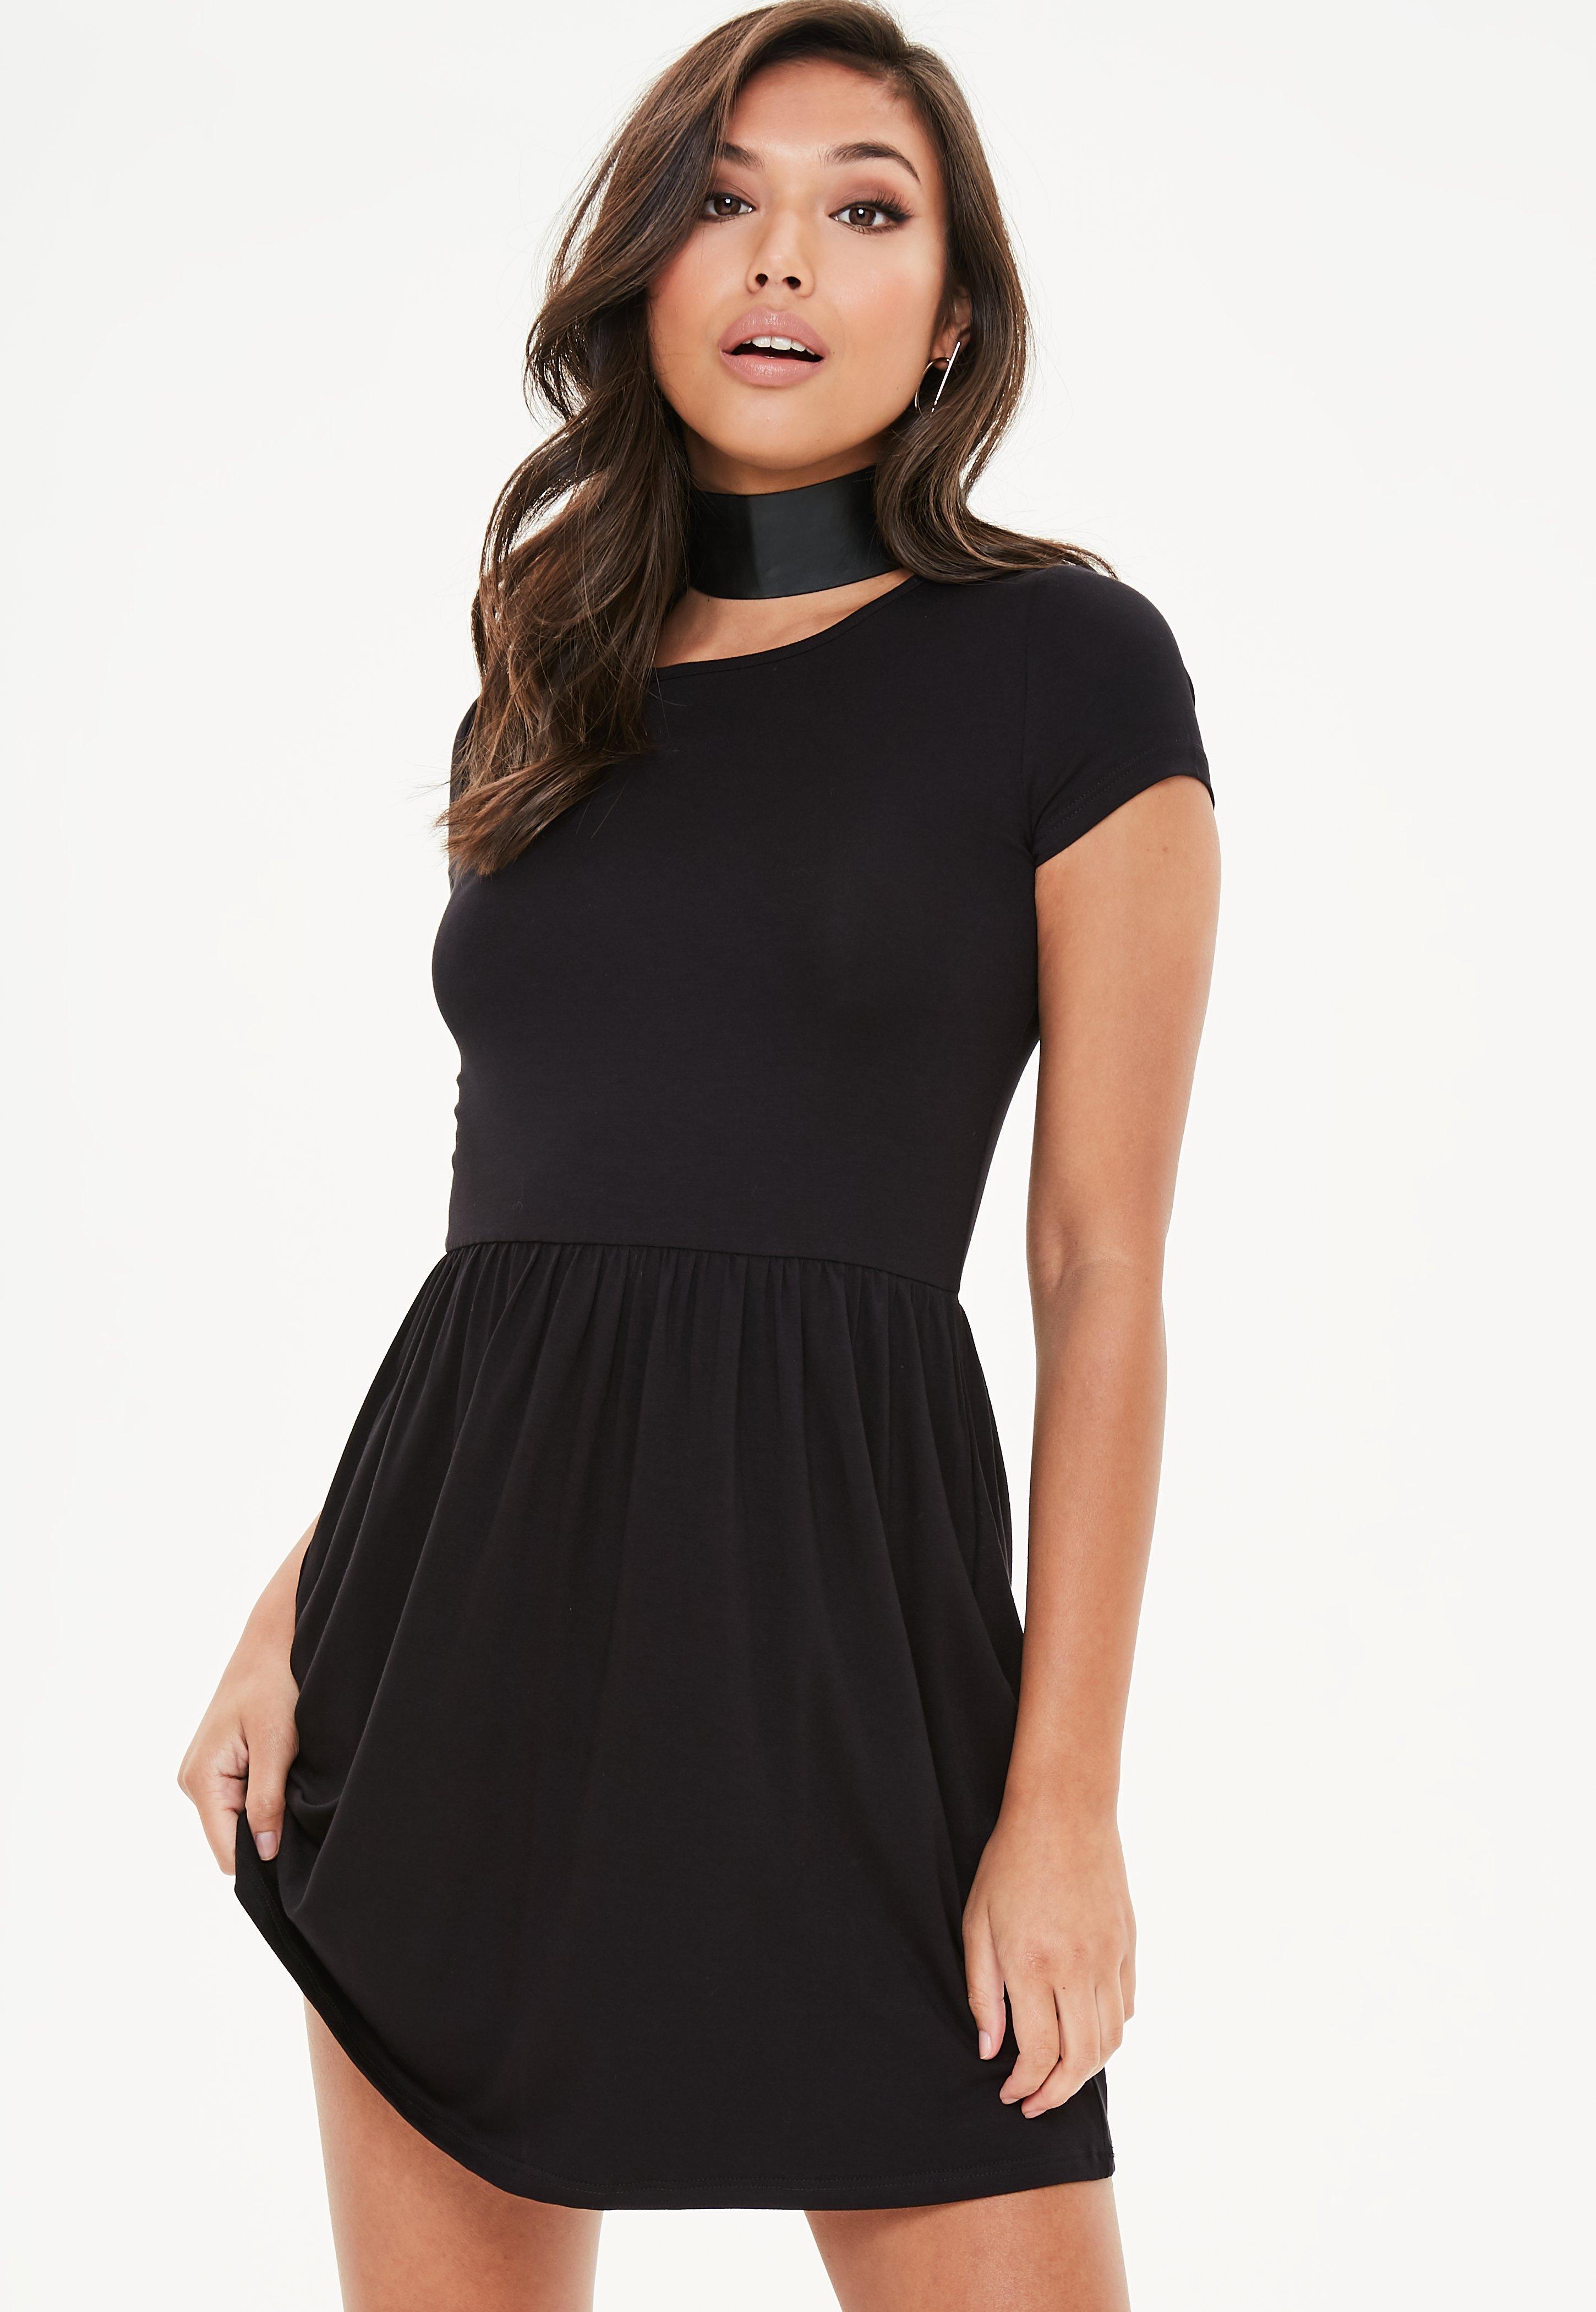 American apparel black fringe dress